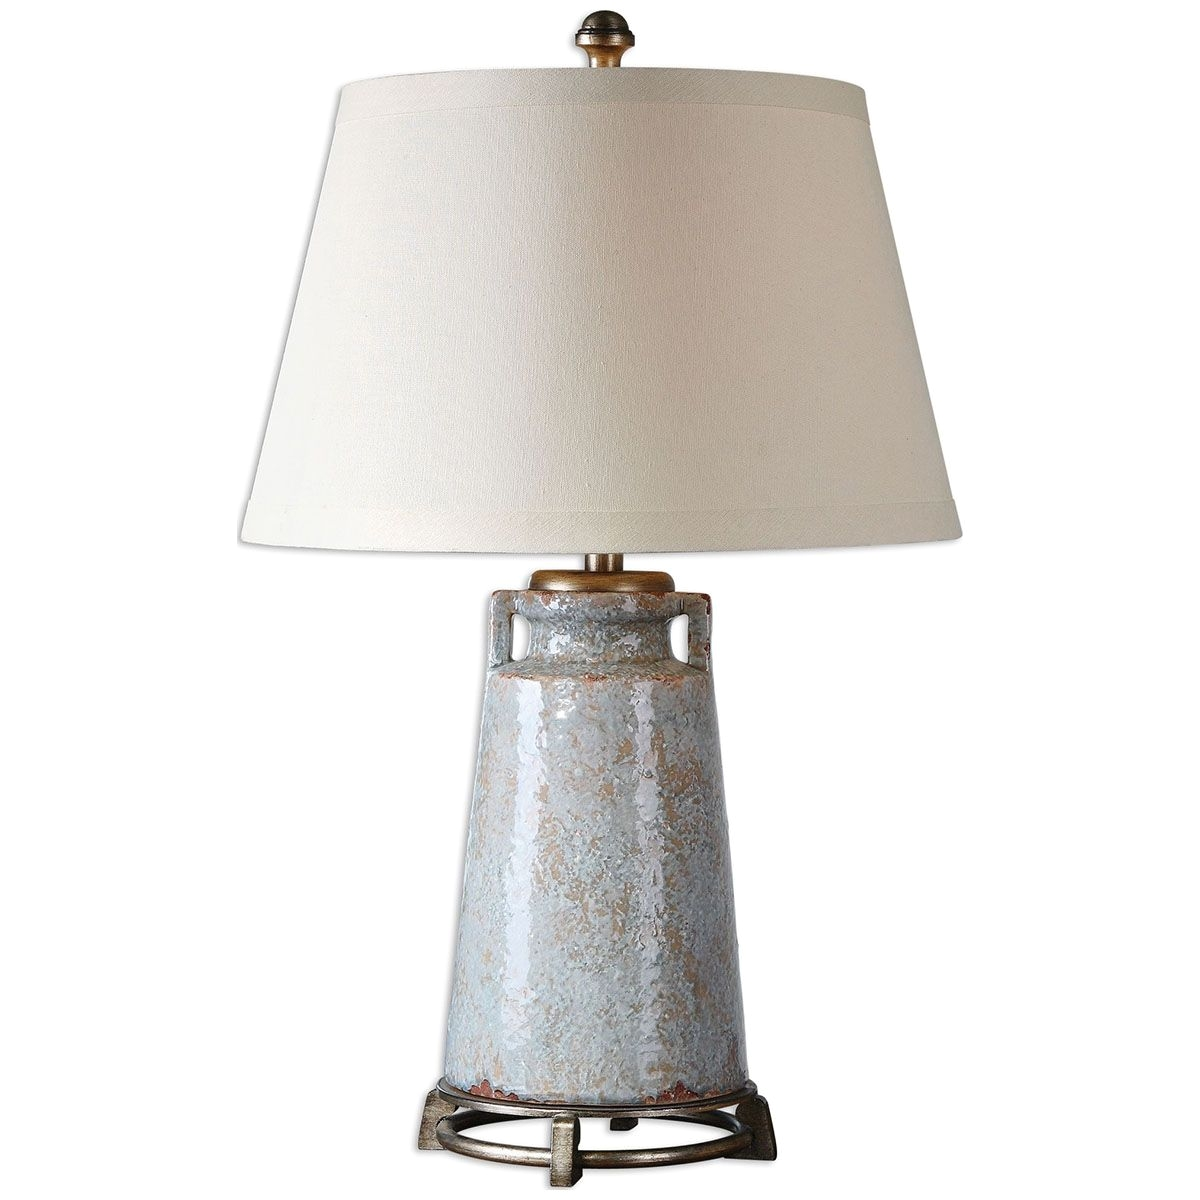 uttermost caminata blue glaze lamp 26557